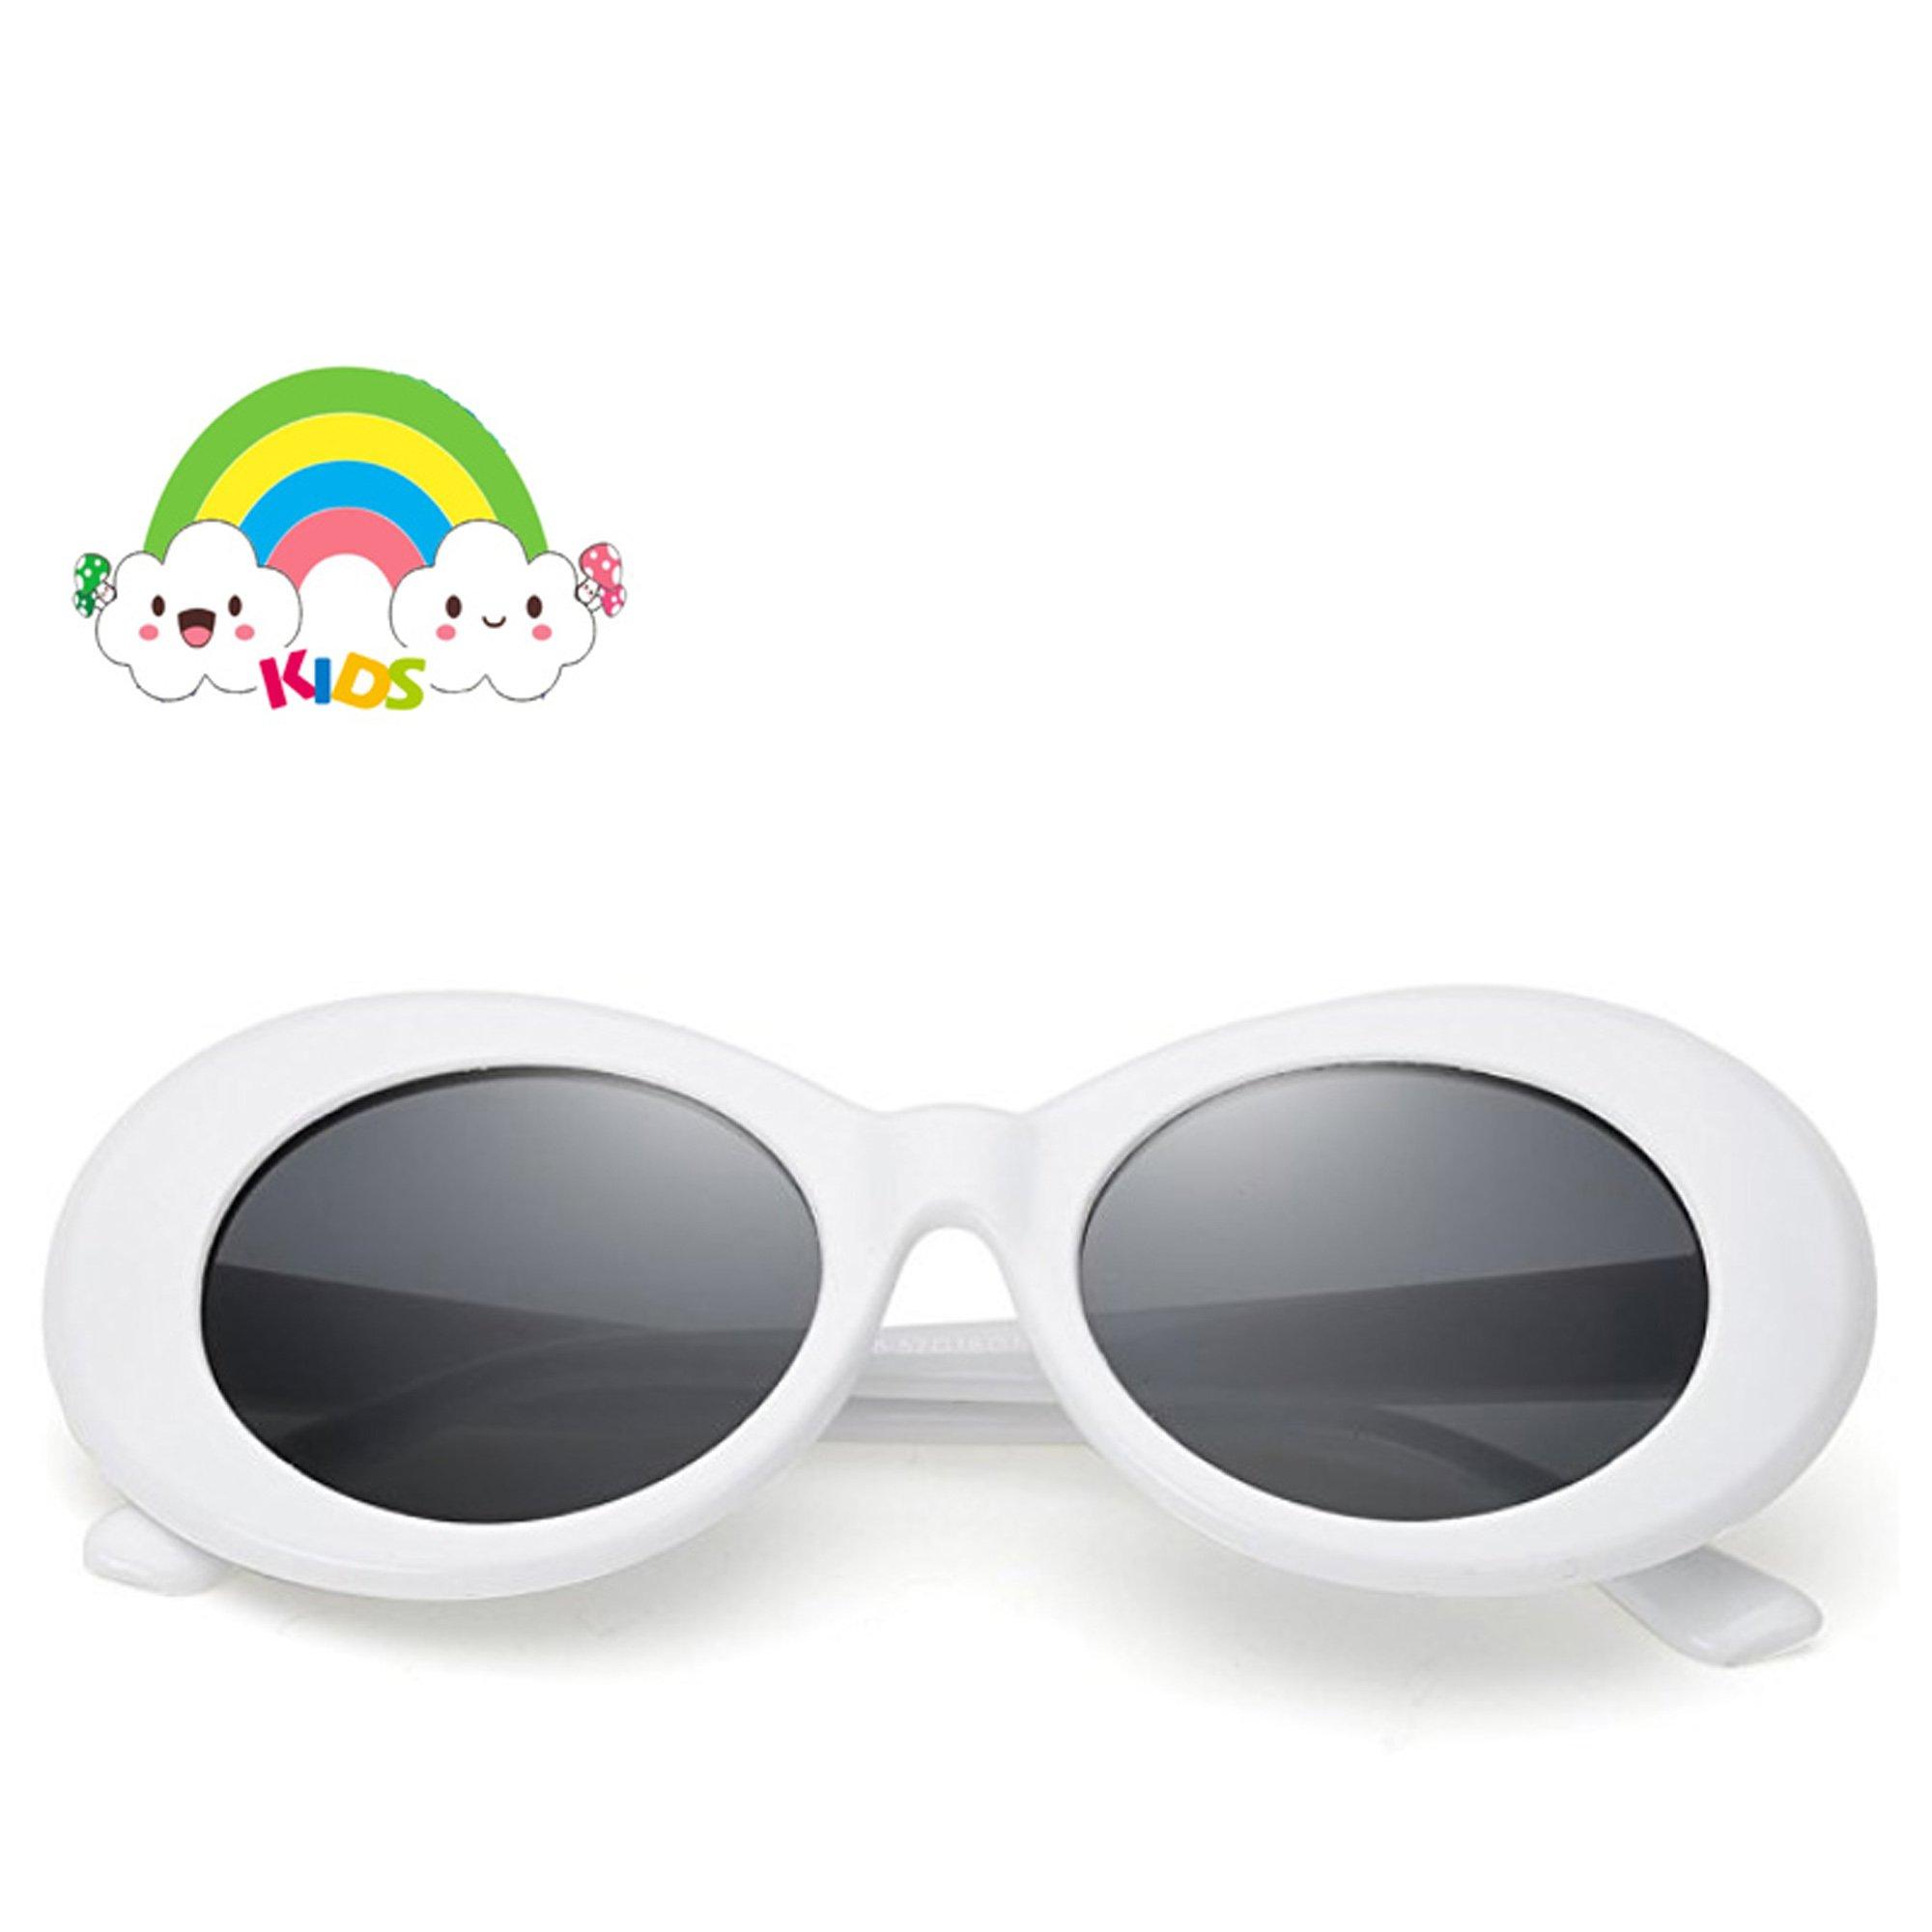 eef4a6de9d Sunglasses for kids